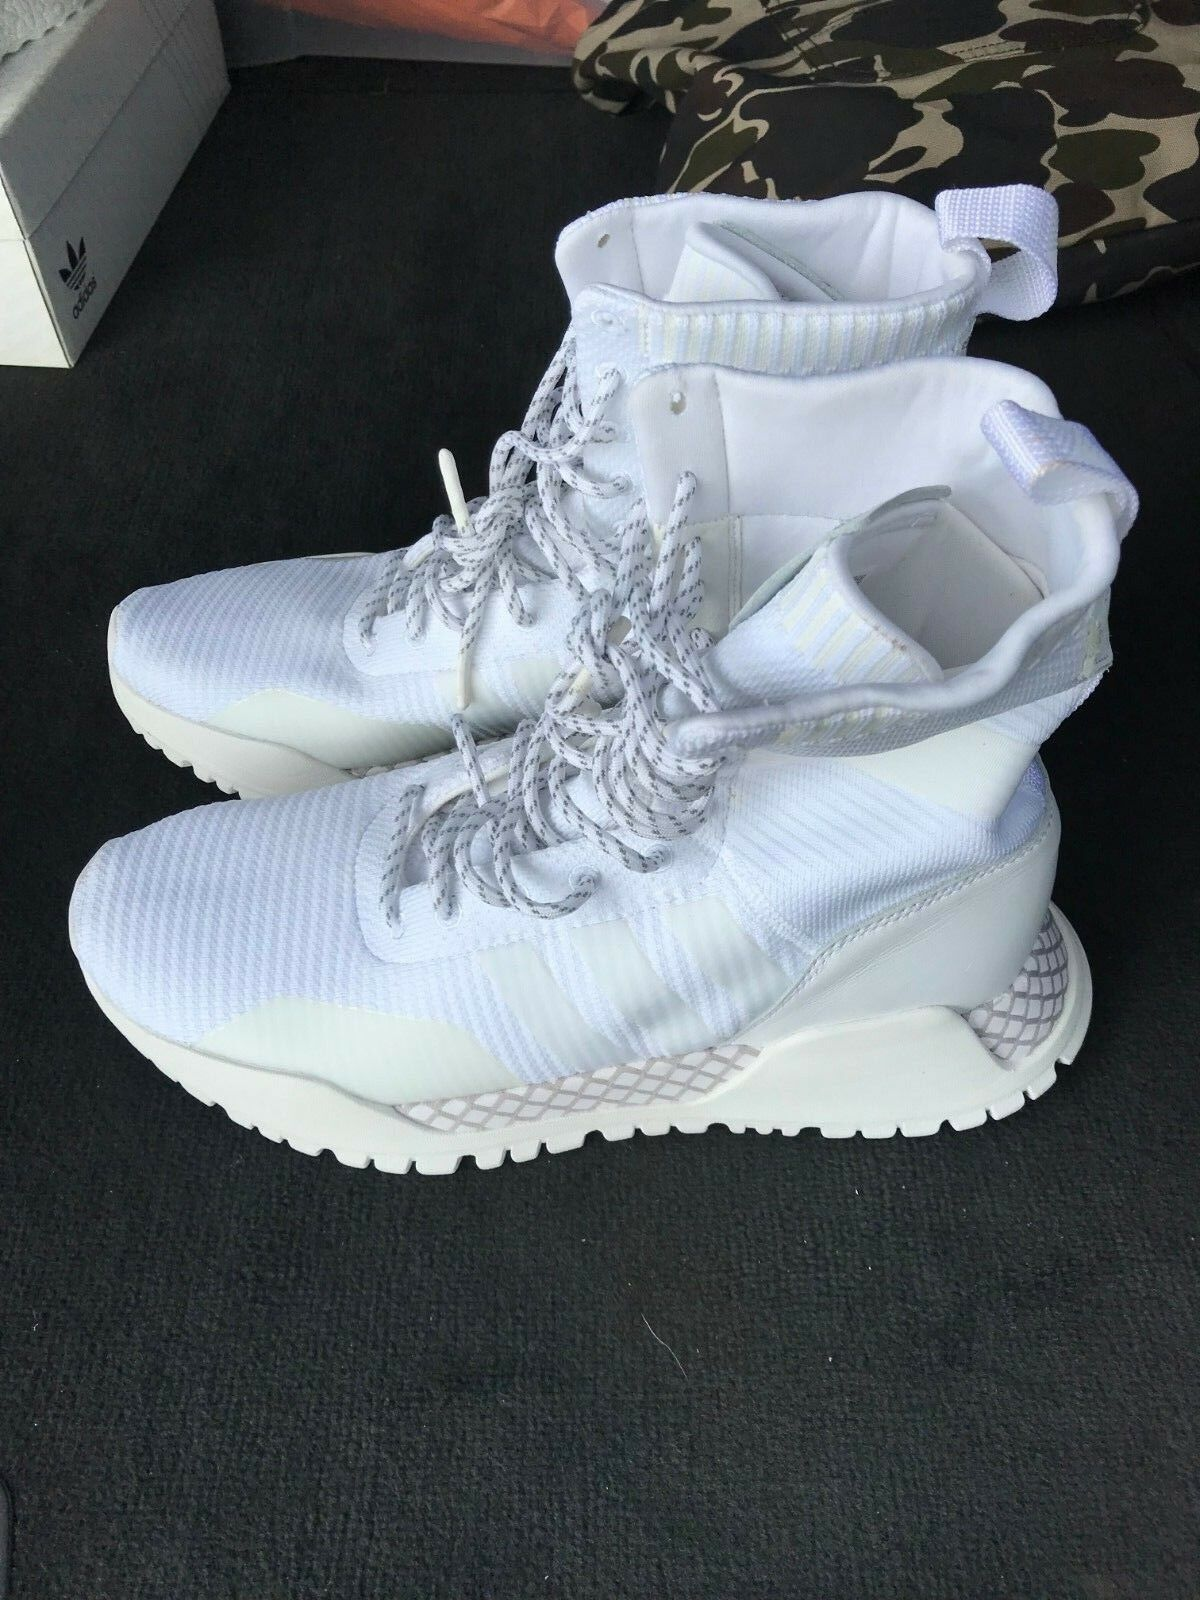 ADIDAS Originals AF 1.3 Primeknit scarpe da ginnastica scarpe da ginnastica con NUOVO con etichetta US 8.5 EU 42 | Design Accattivante  | Scolaro/Ragazze Scarpa